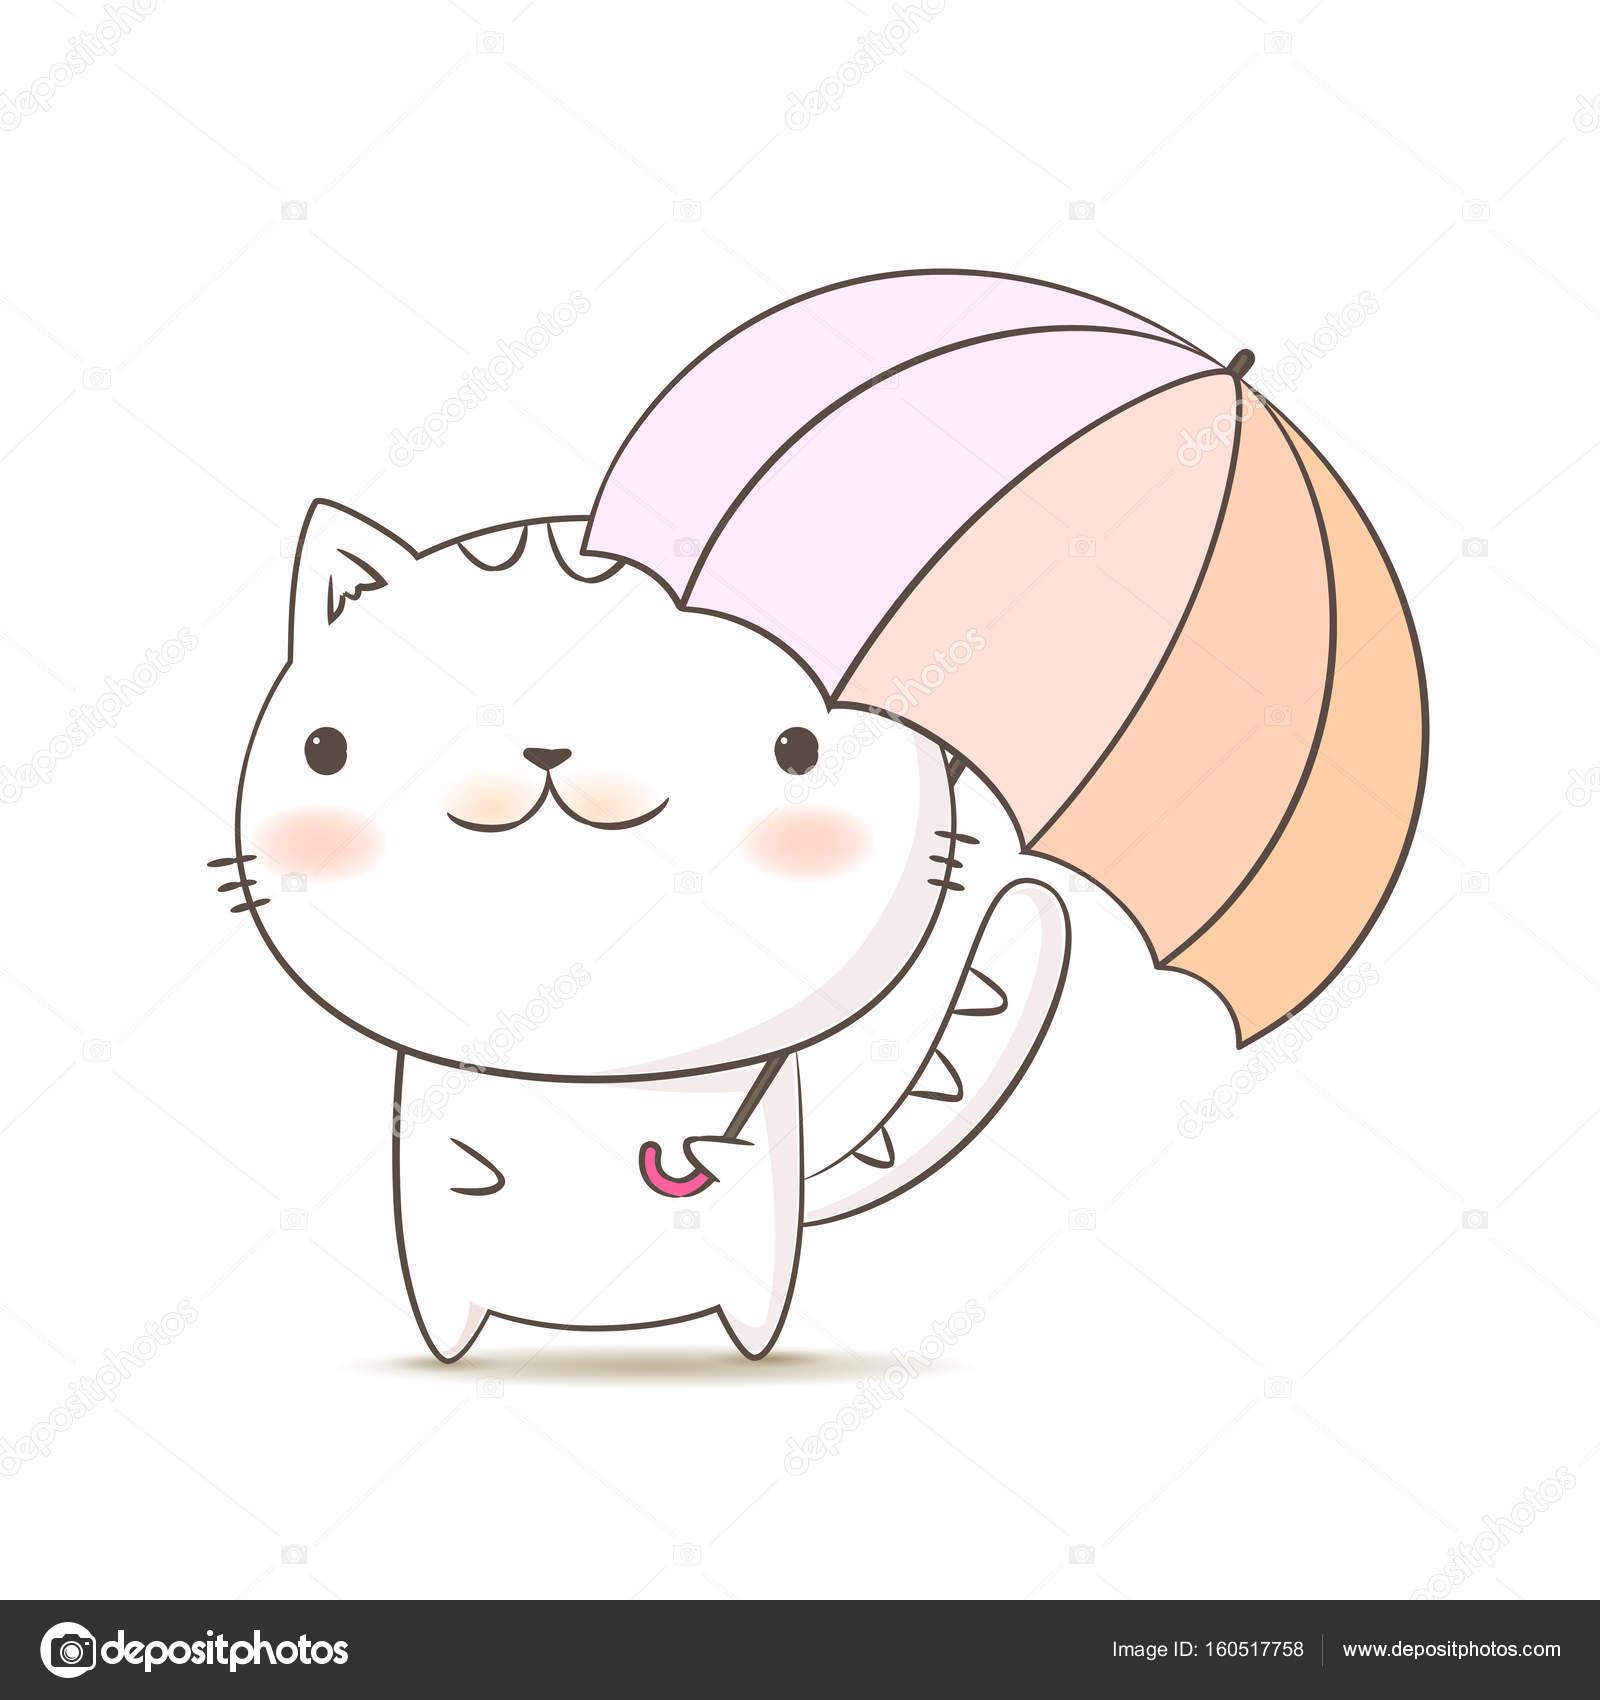 cat holding umbrella cute kitten cartoon hand draw doodle style